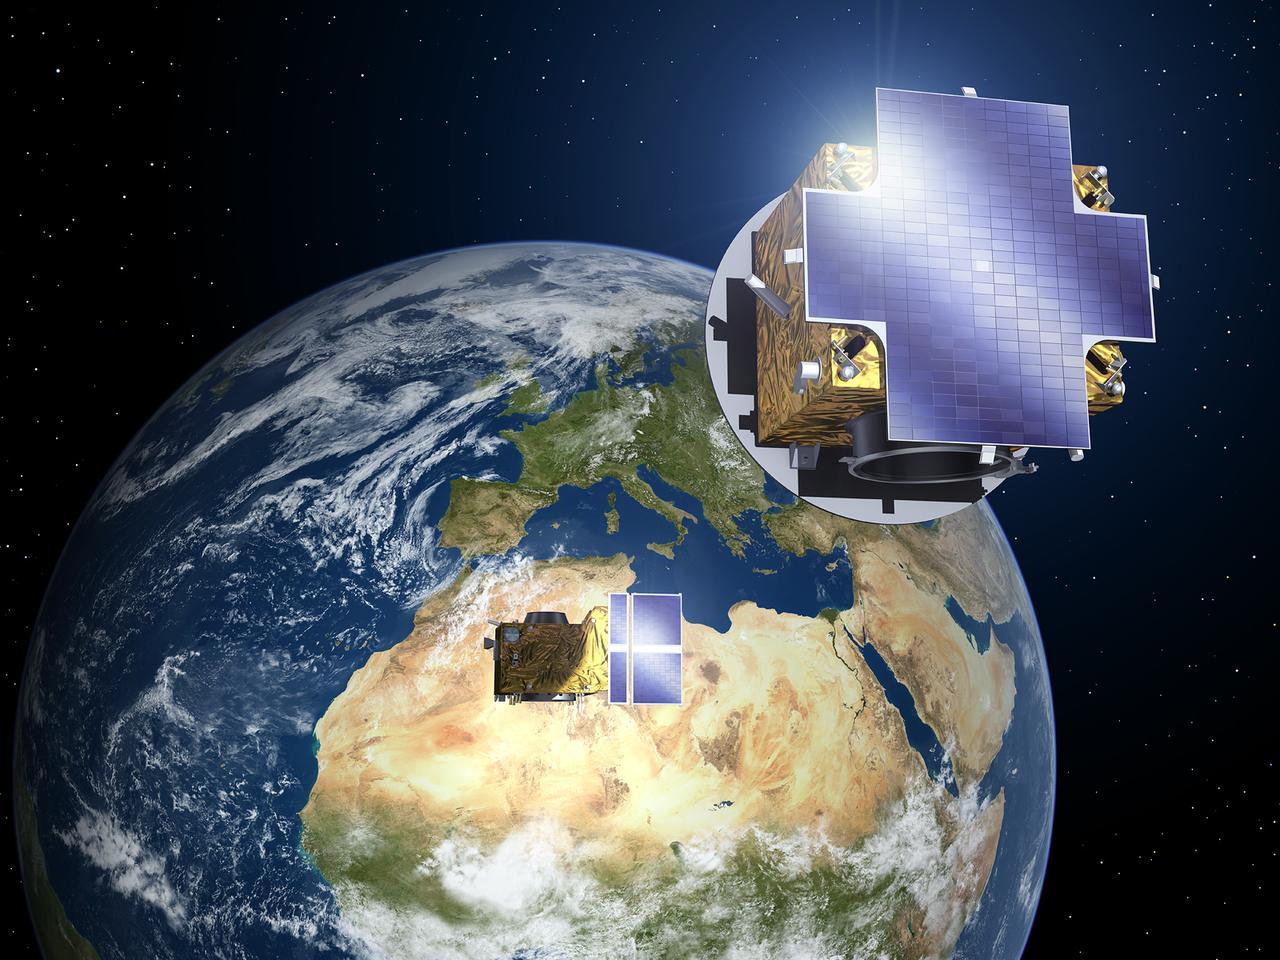 Proba-3 satellites in formation